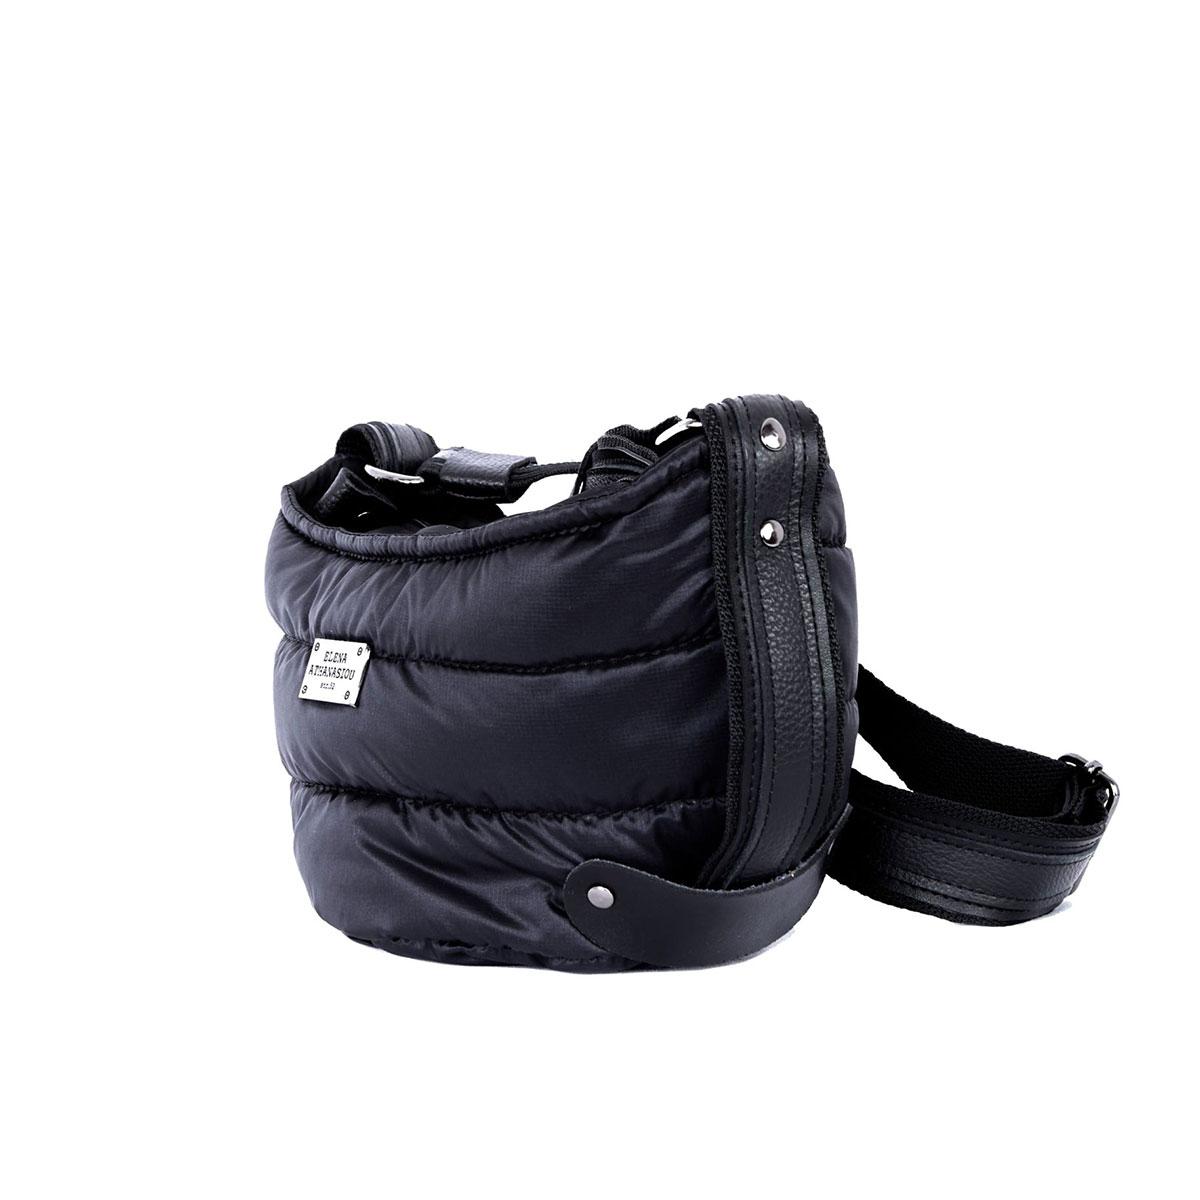 Puffer Body Bag Black Small